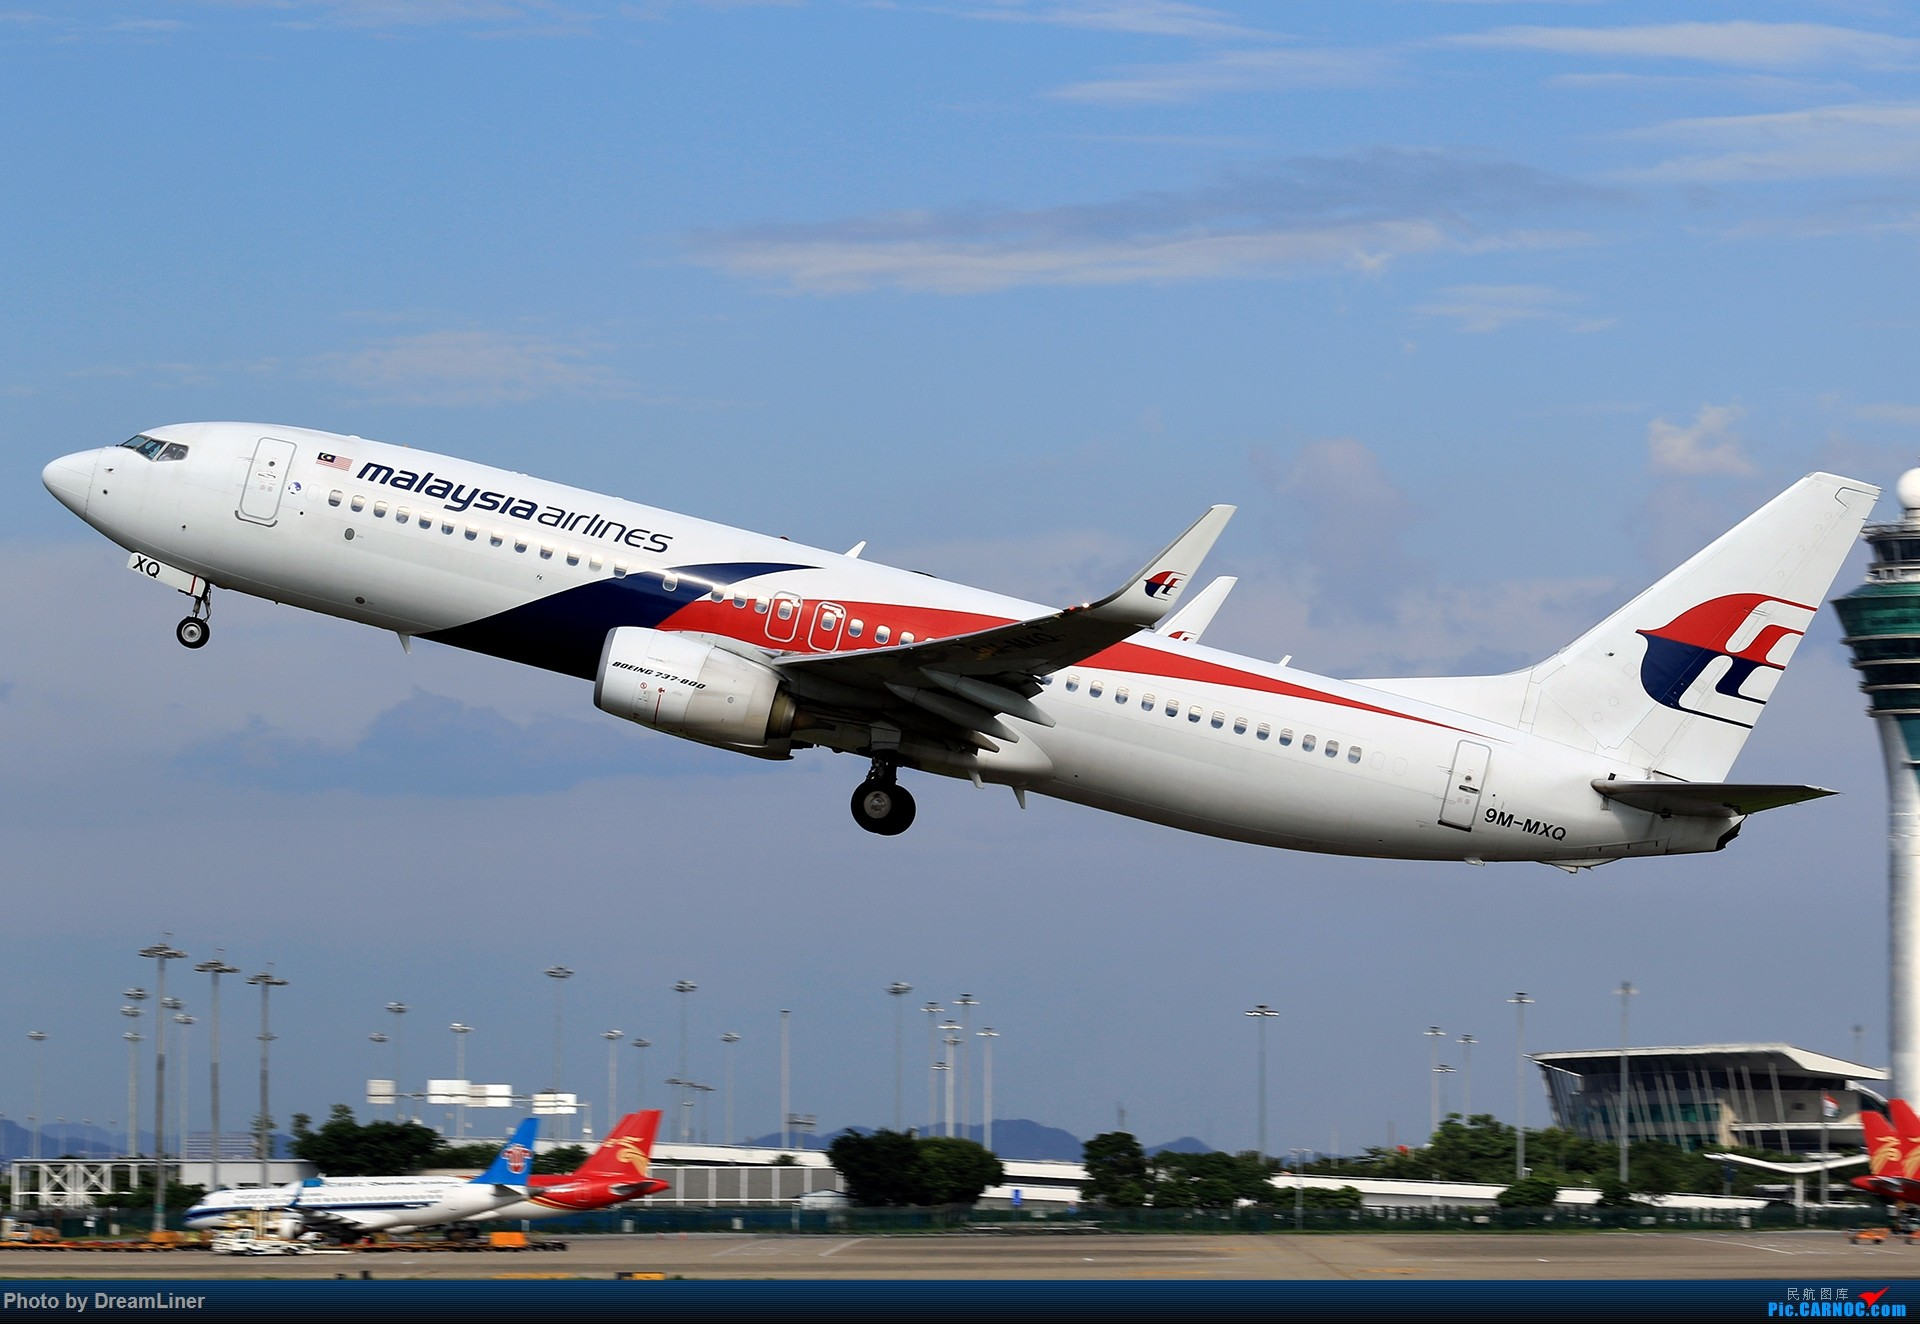 Re:[原创]【CAN】又是诱人的蓝天 BOEING 737-800 9M-MXQ 中国广州白云国际机场